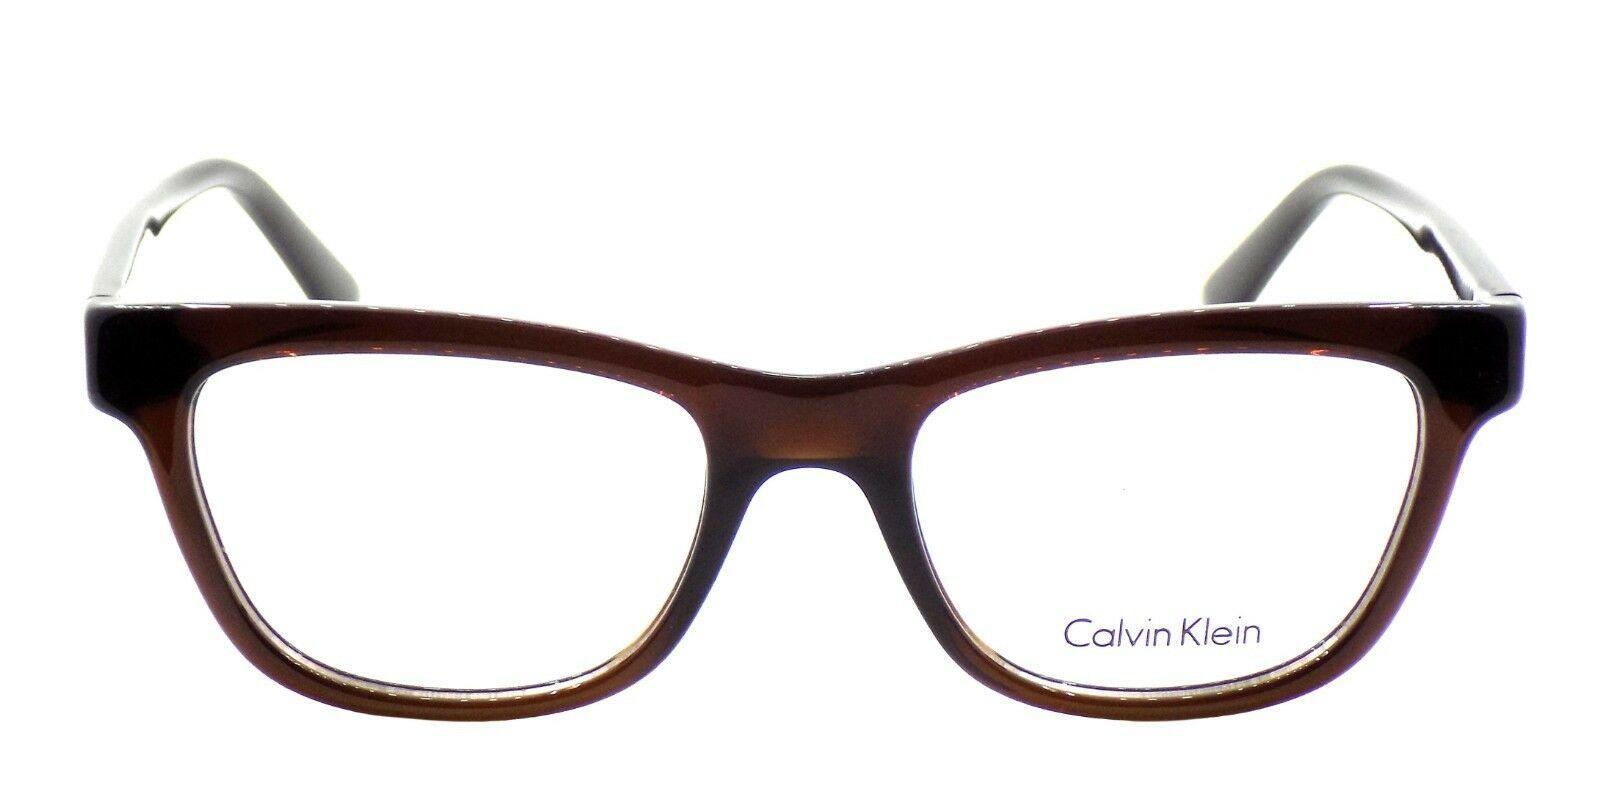 Calvin Klein CK5908 201 Women's Eyeglasses Frames Brown 51-18-140 + CASE